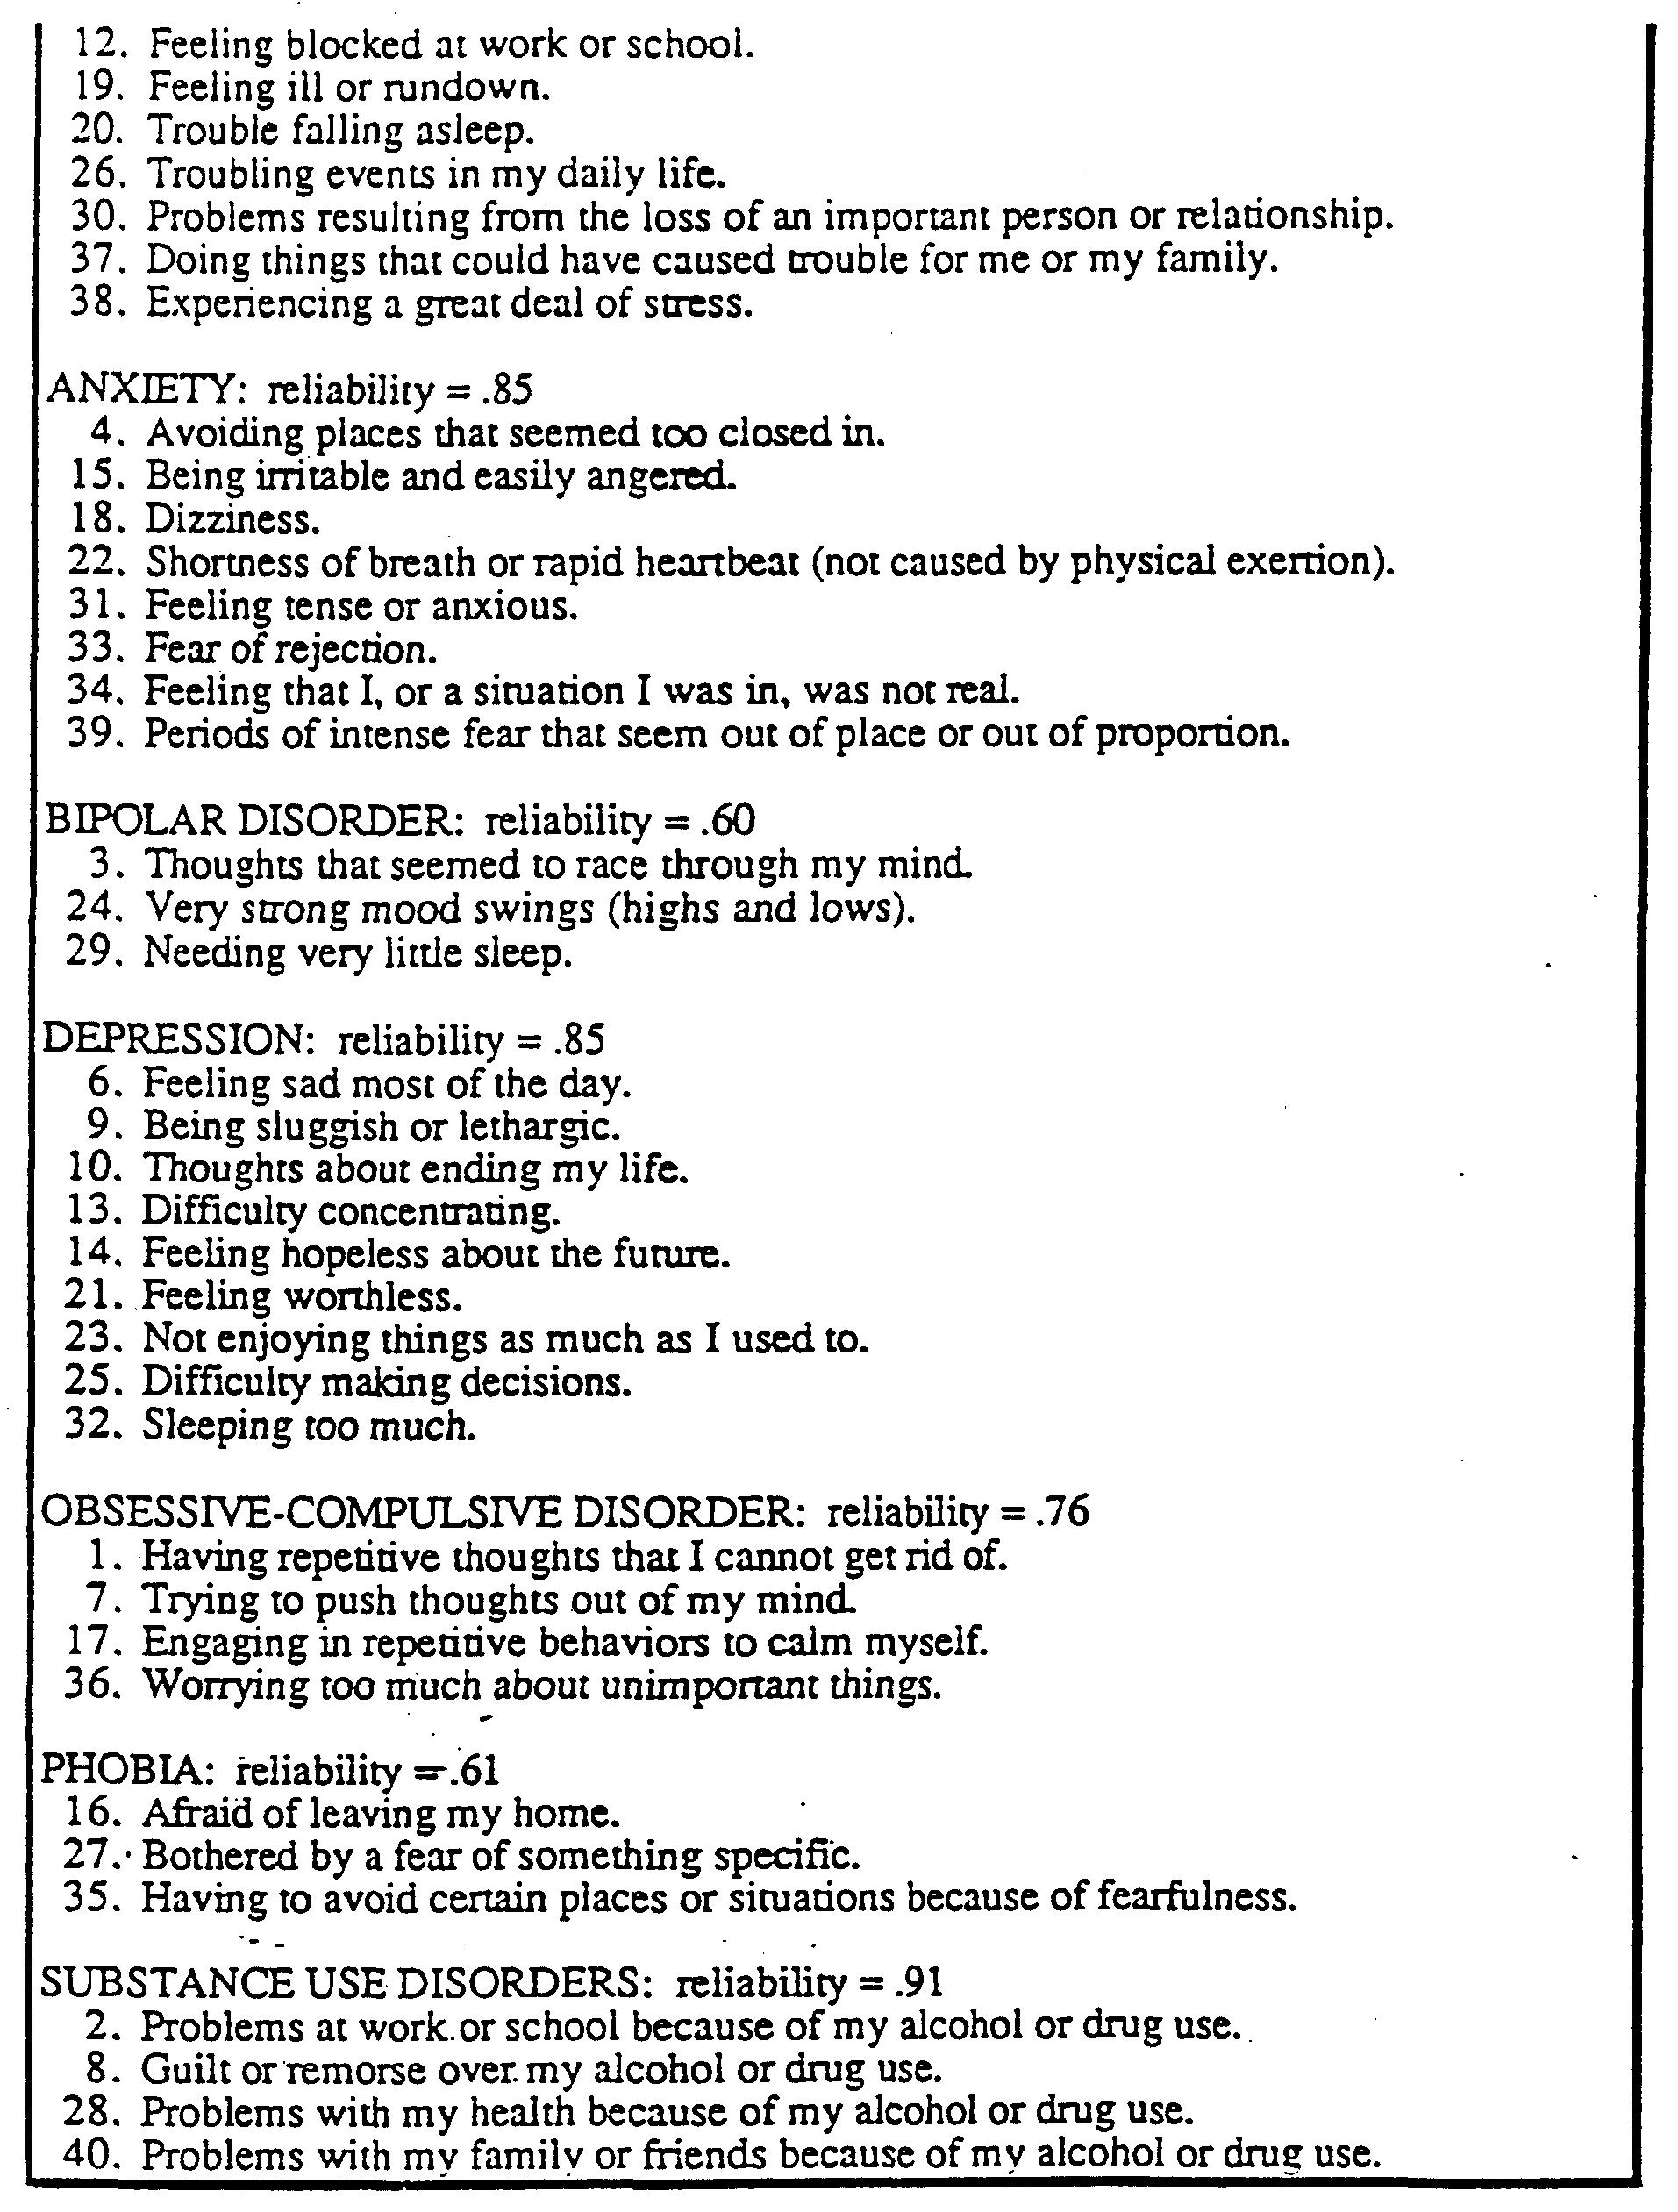 nursing assessment template